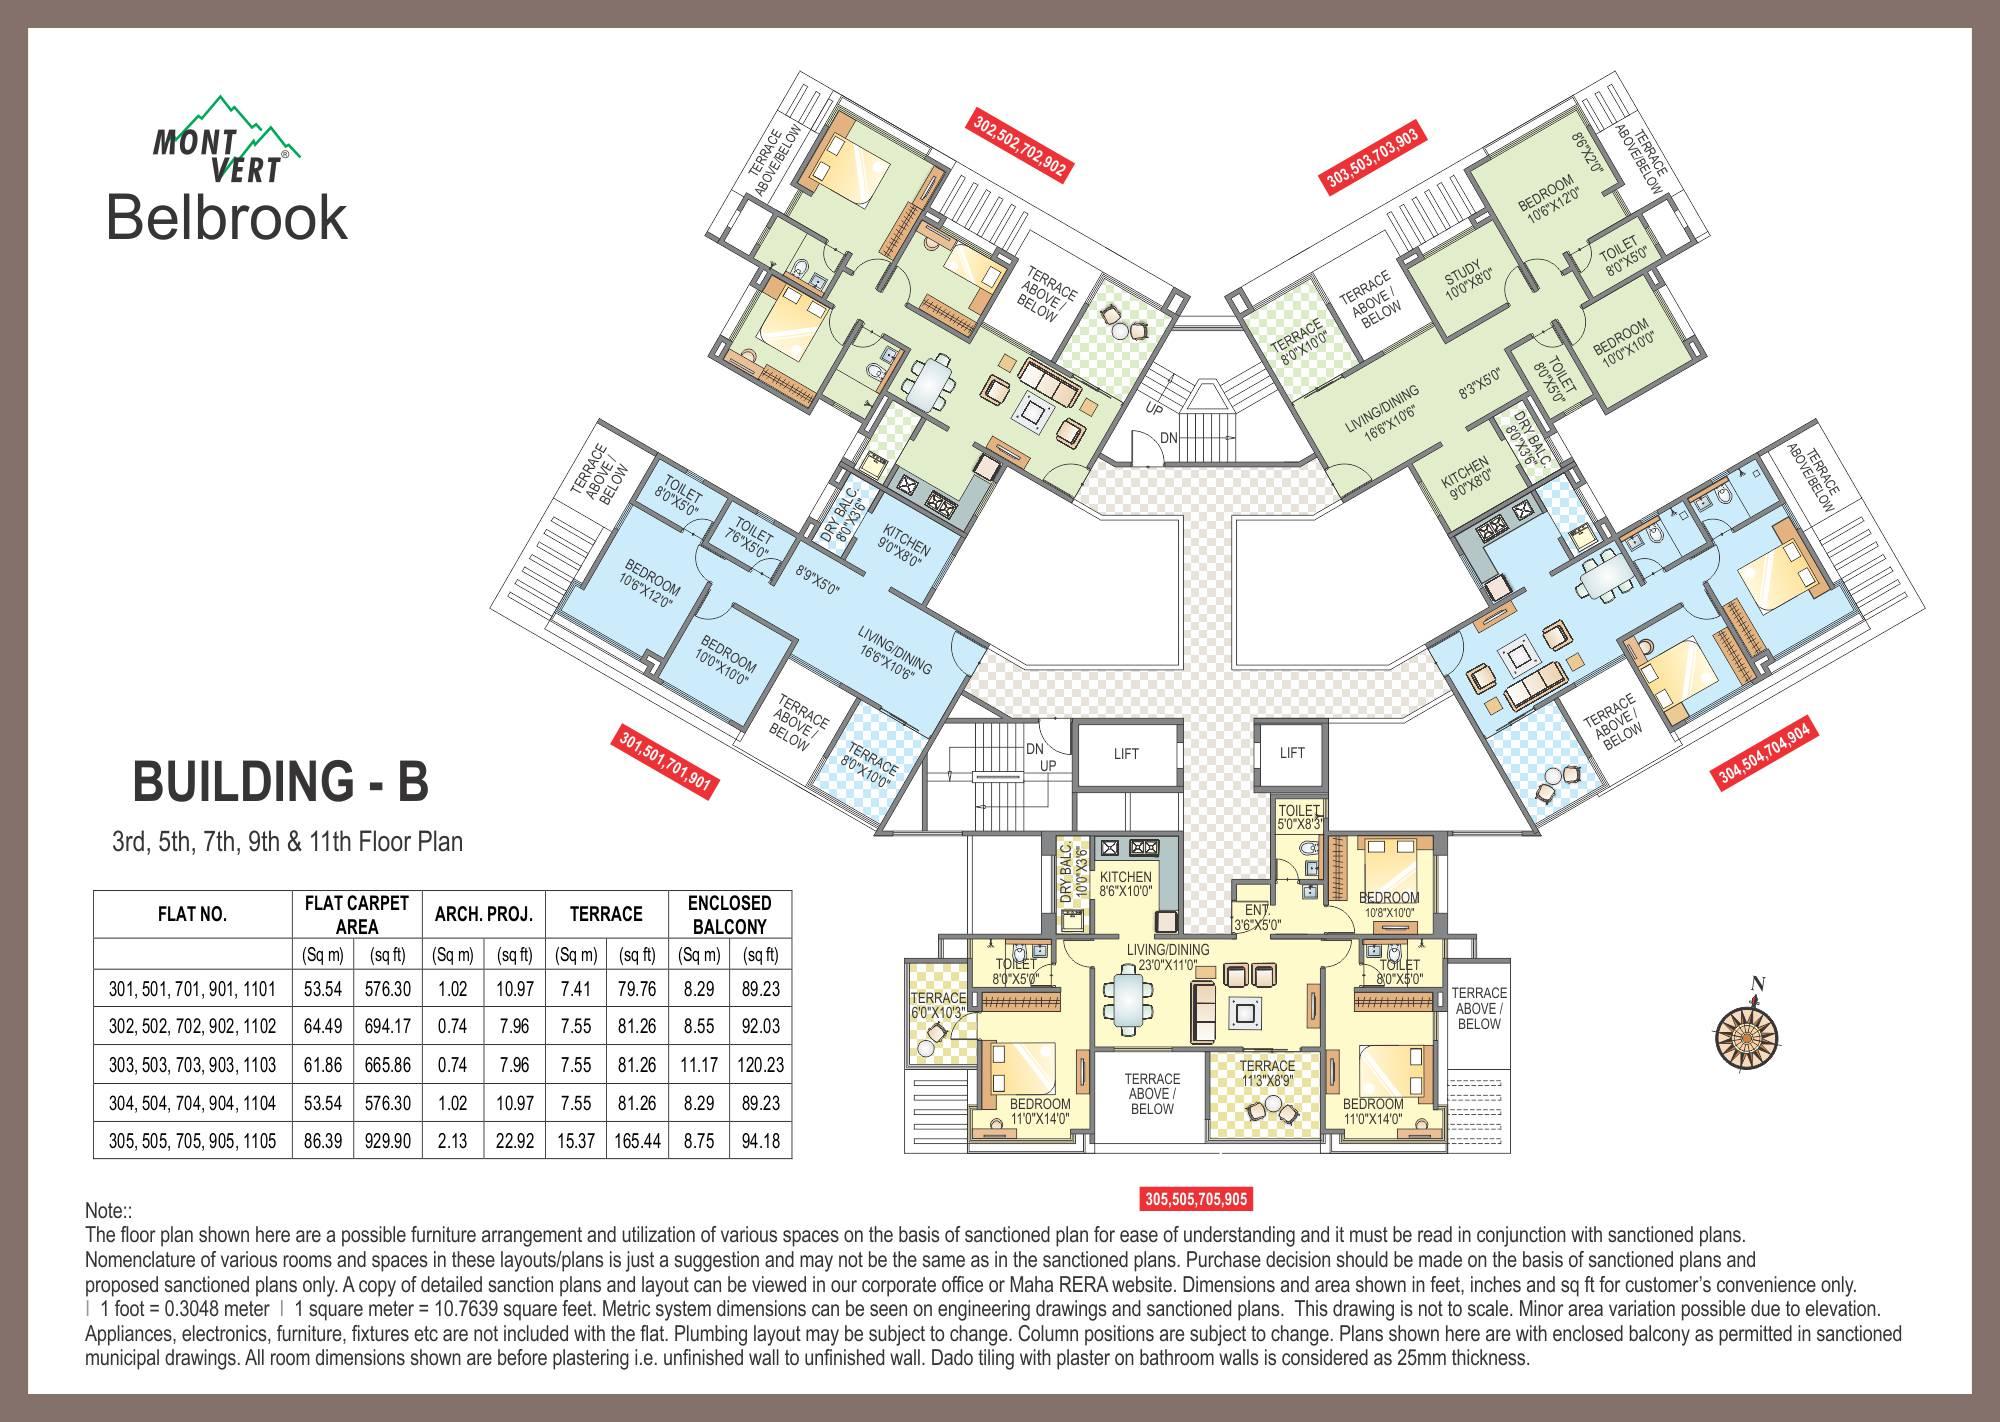 Apartments In Bhugaon Mont Vert Belbrook B Odd P